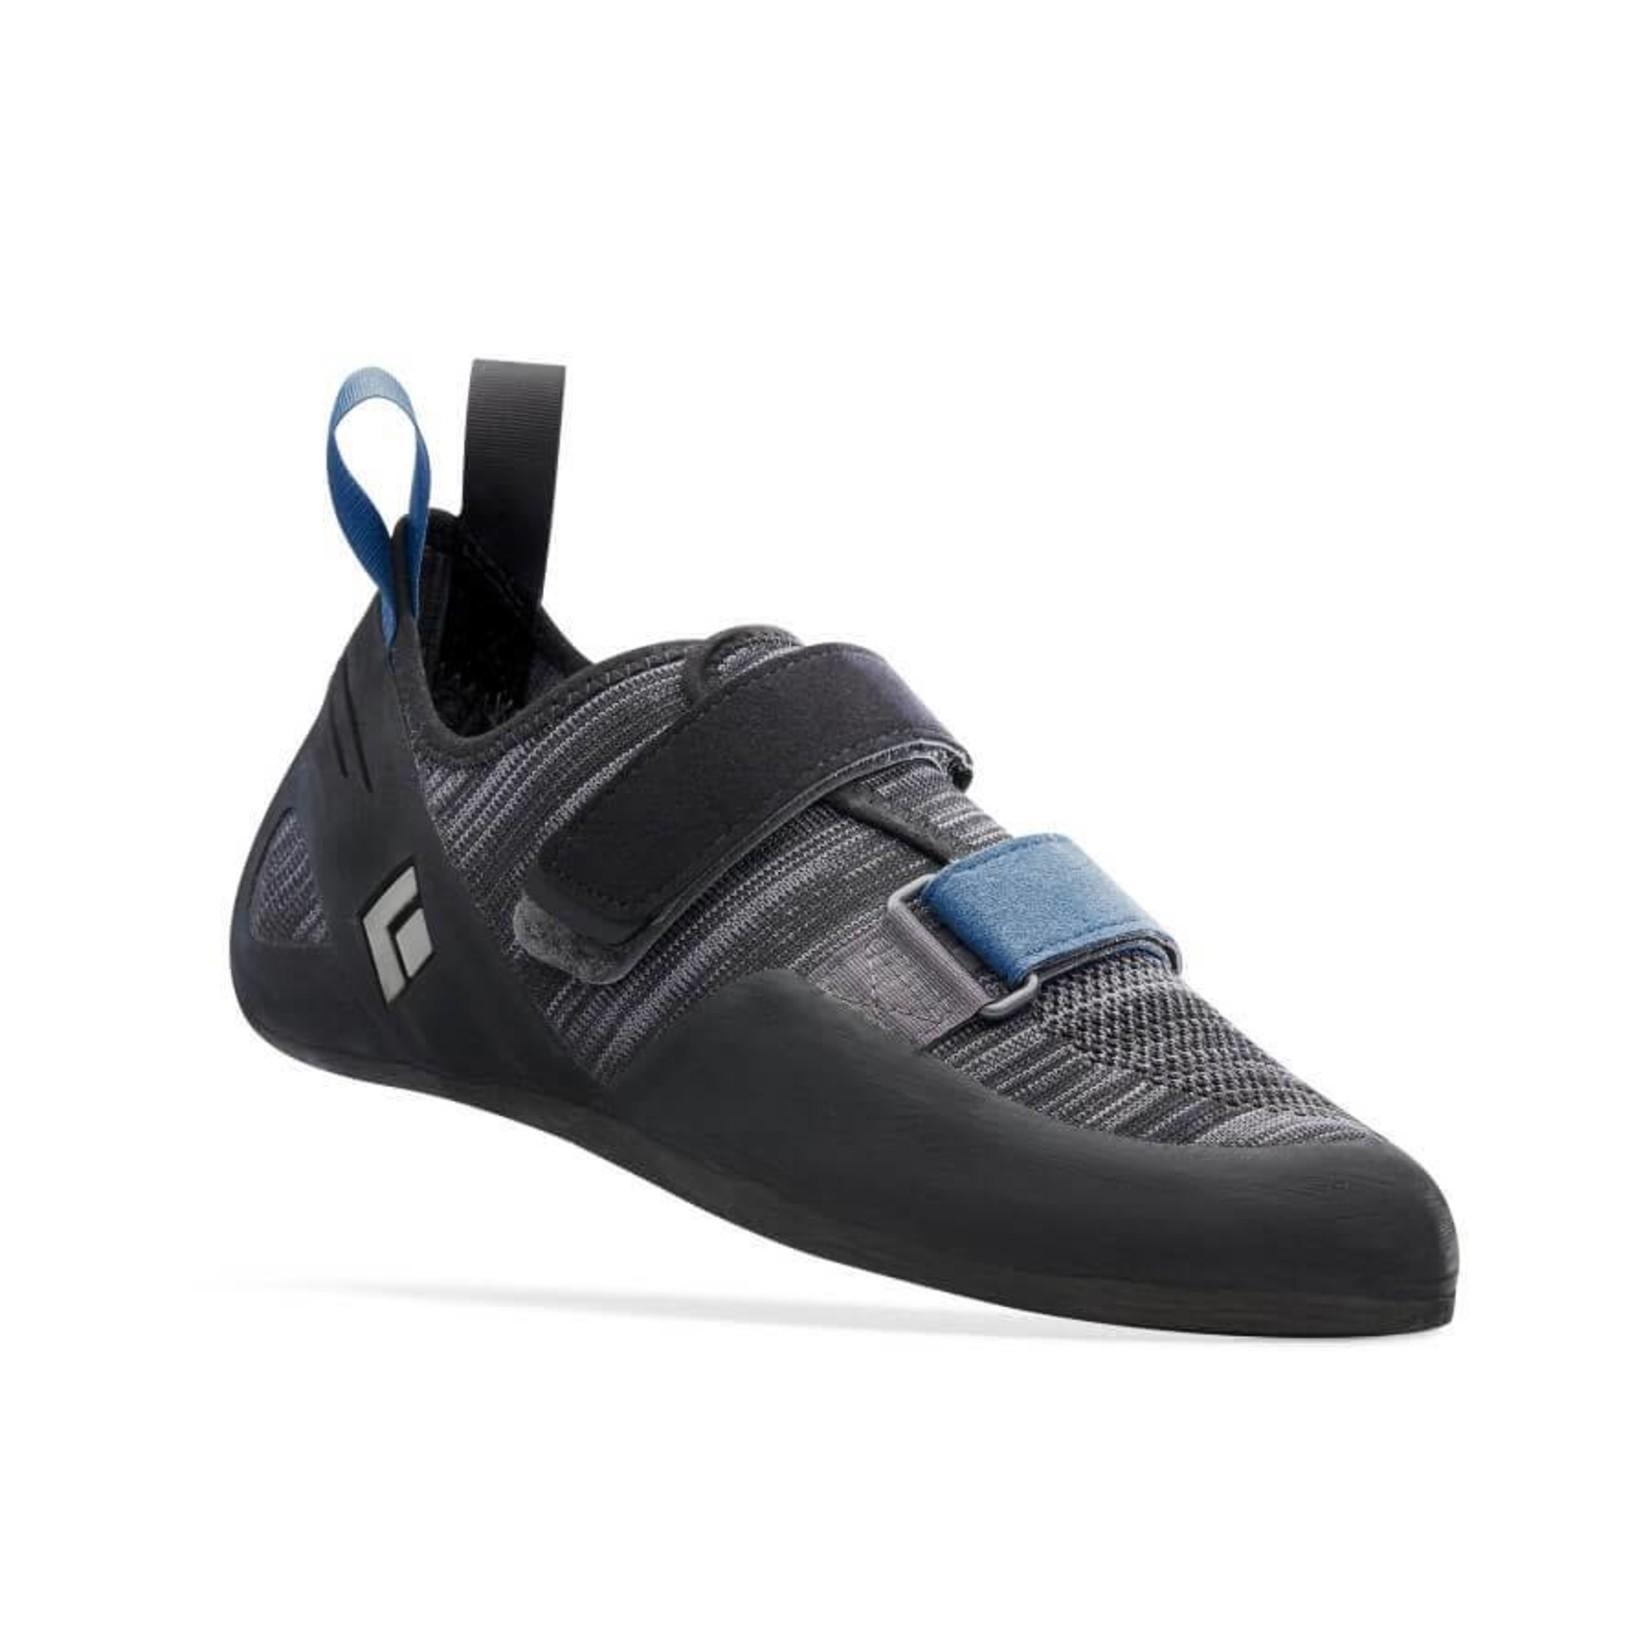 Black Diamond Black Diamond Momentum Climbing Shoes - Men